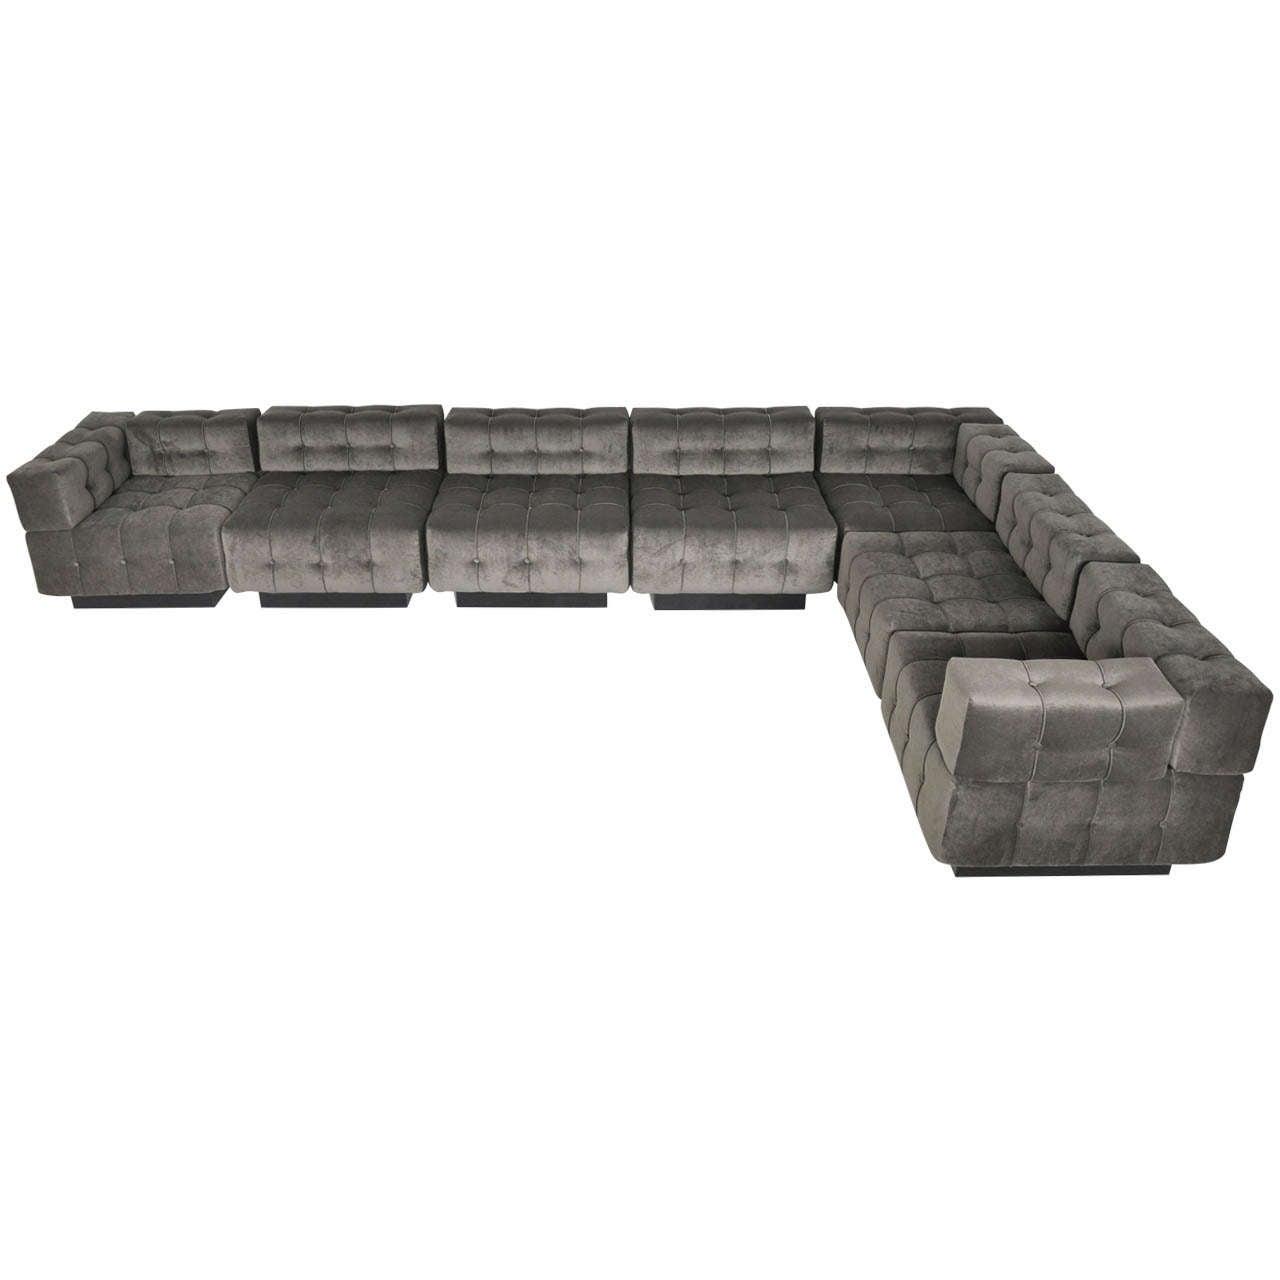 Harvey probber modular sofa at 1stdibs for Modern modular sectional puzzle sofa